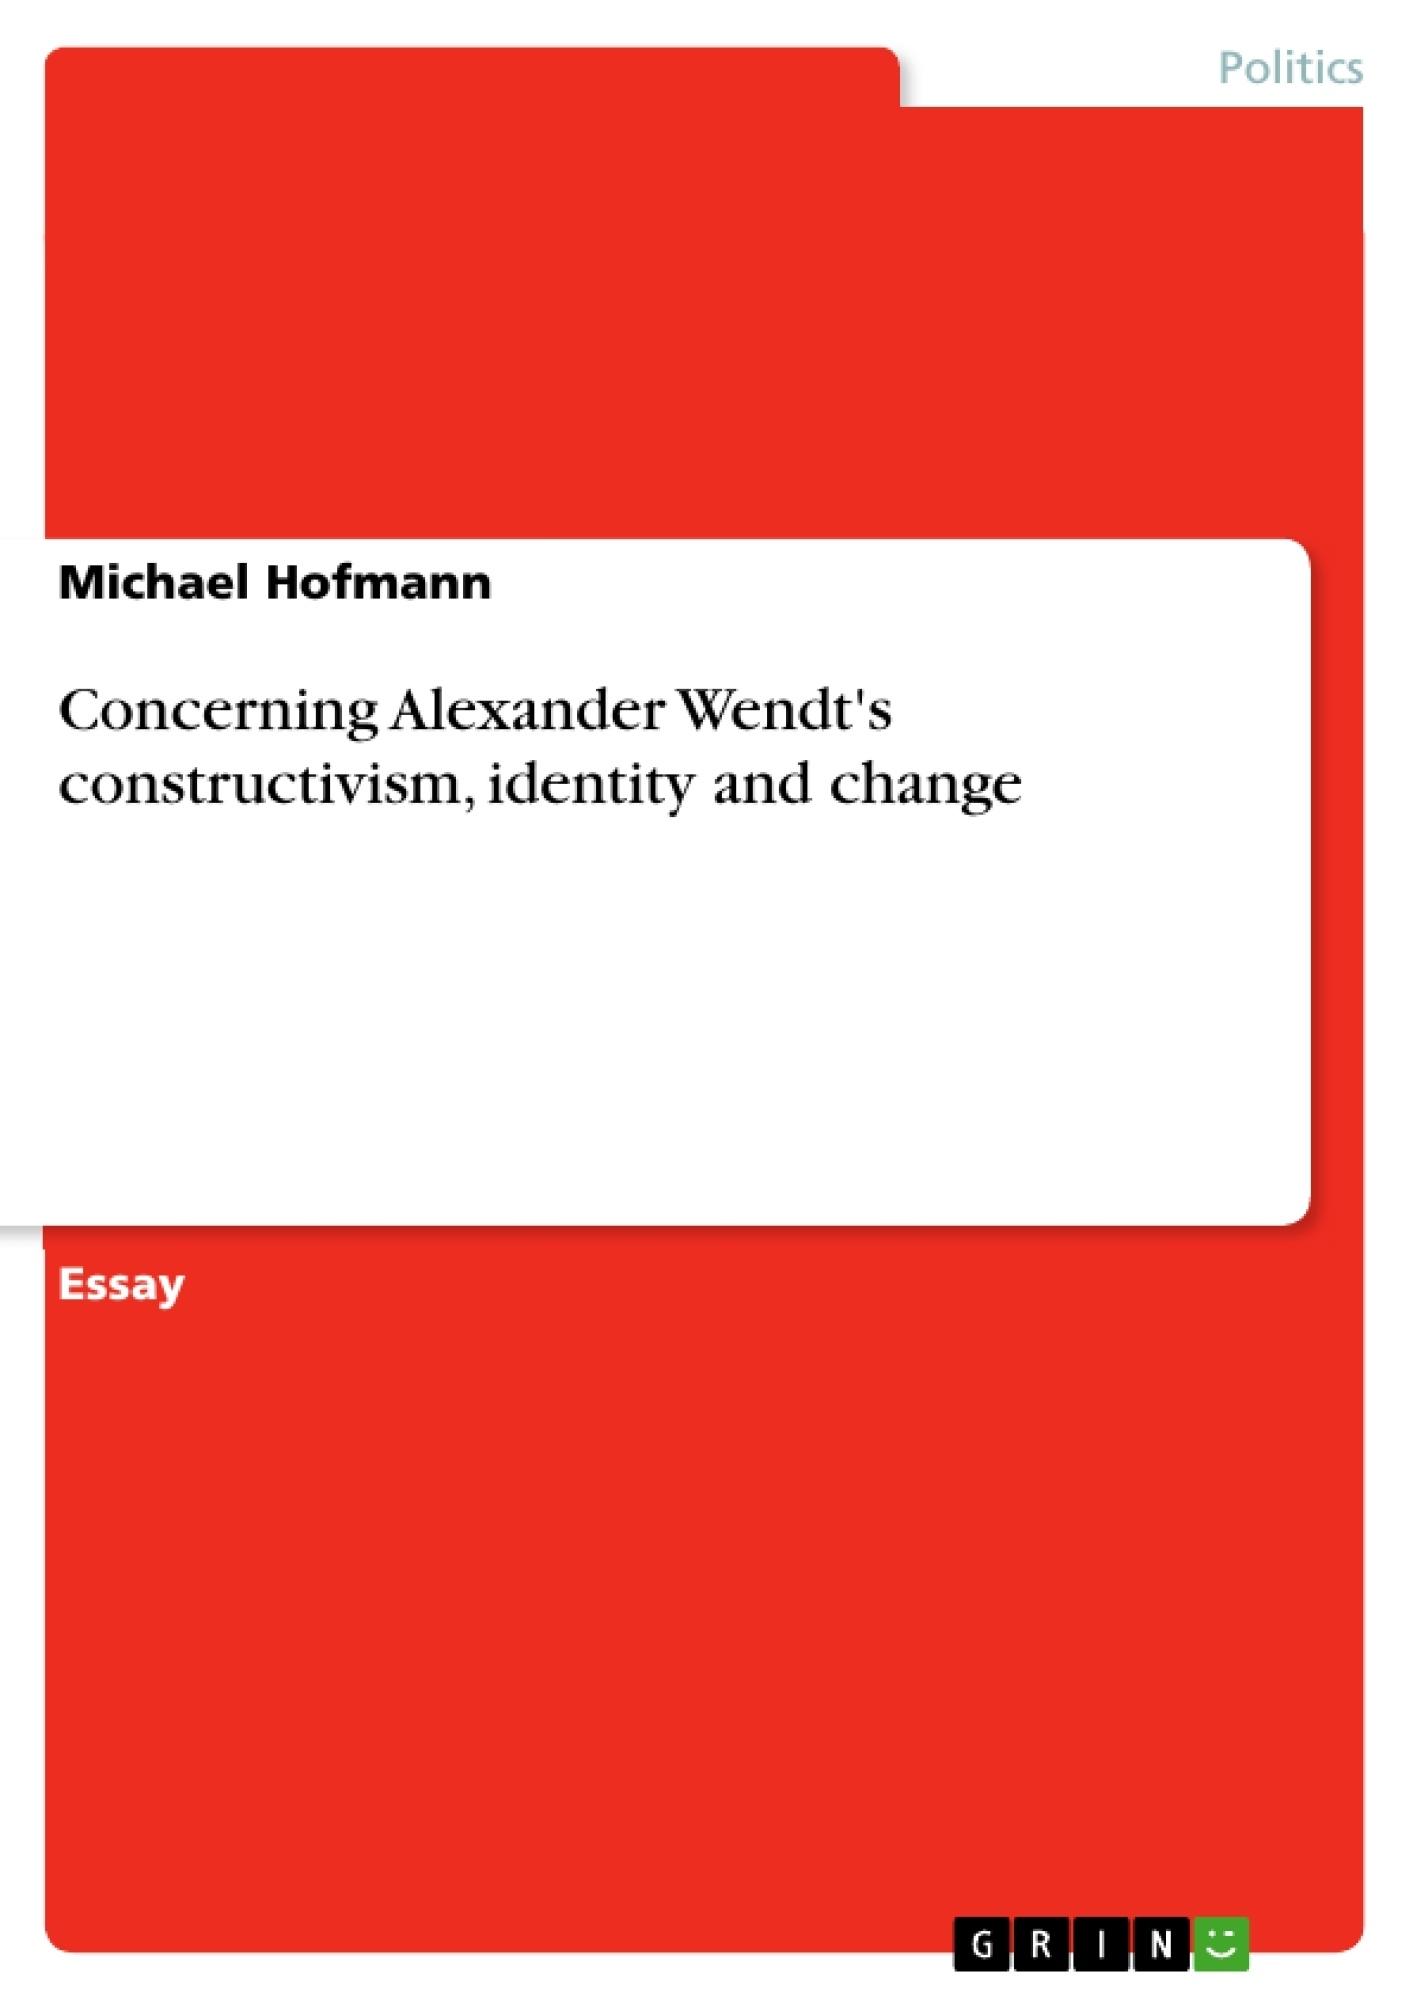 Title: Concerning Alexander Wendt's constructivism, identity and change